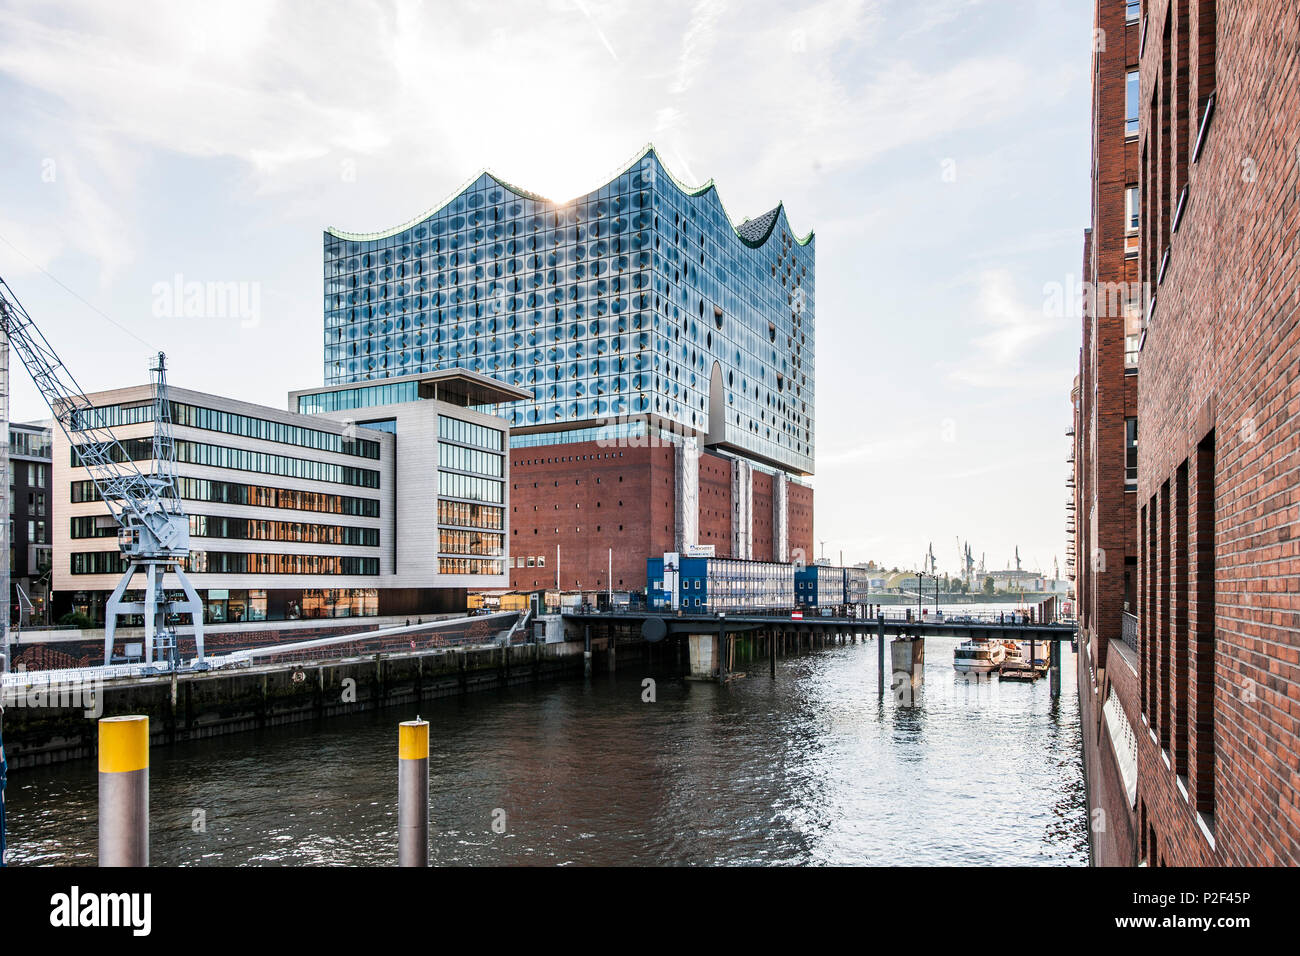 Elbphilharmonie in the Hafencity of Hamburg, north Germany, Germany - Stock Image